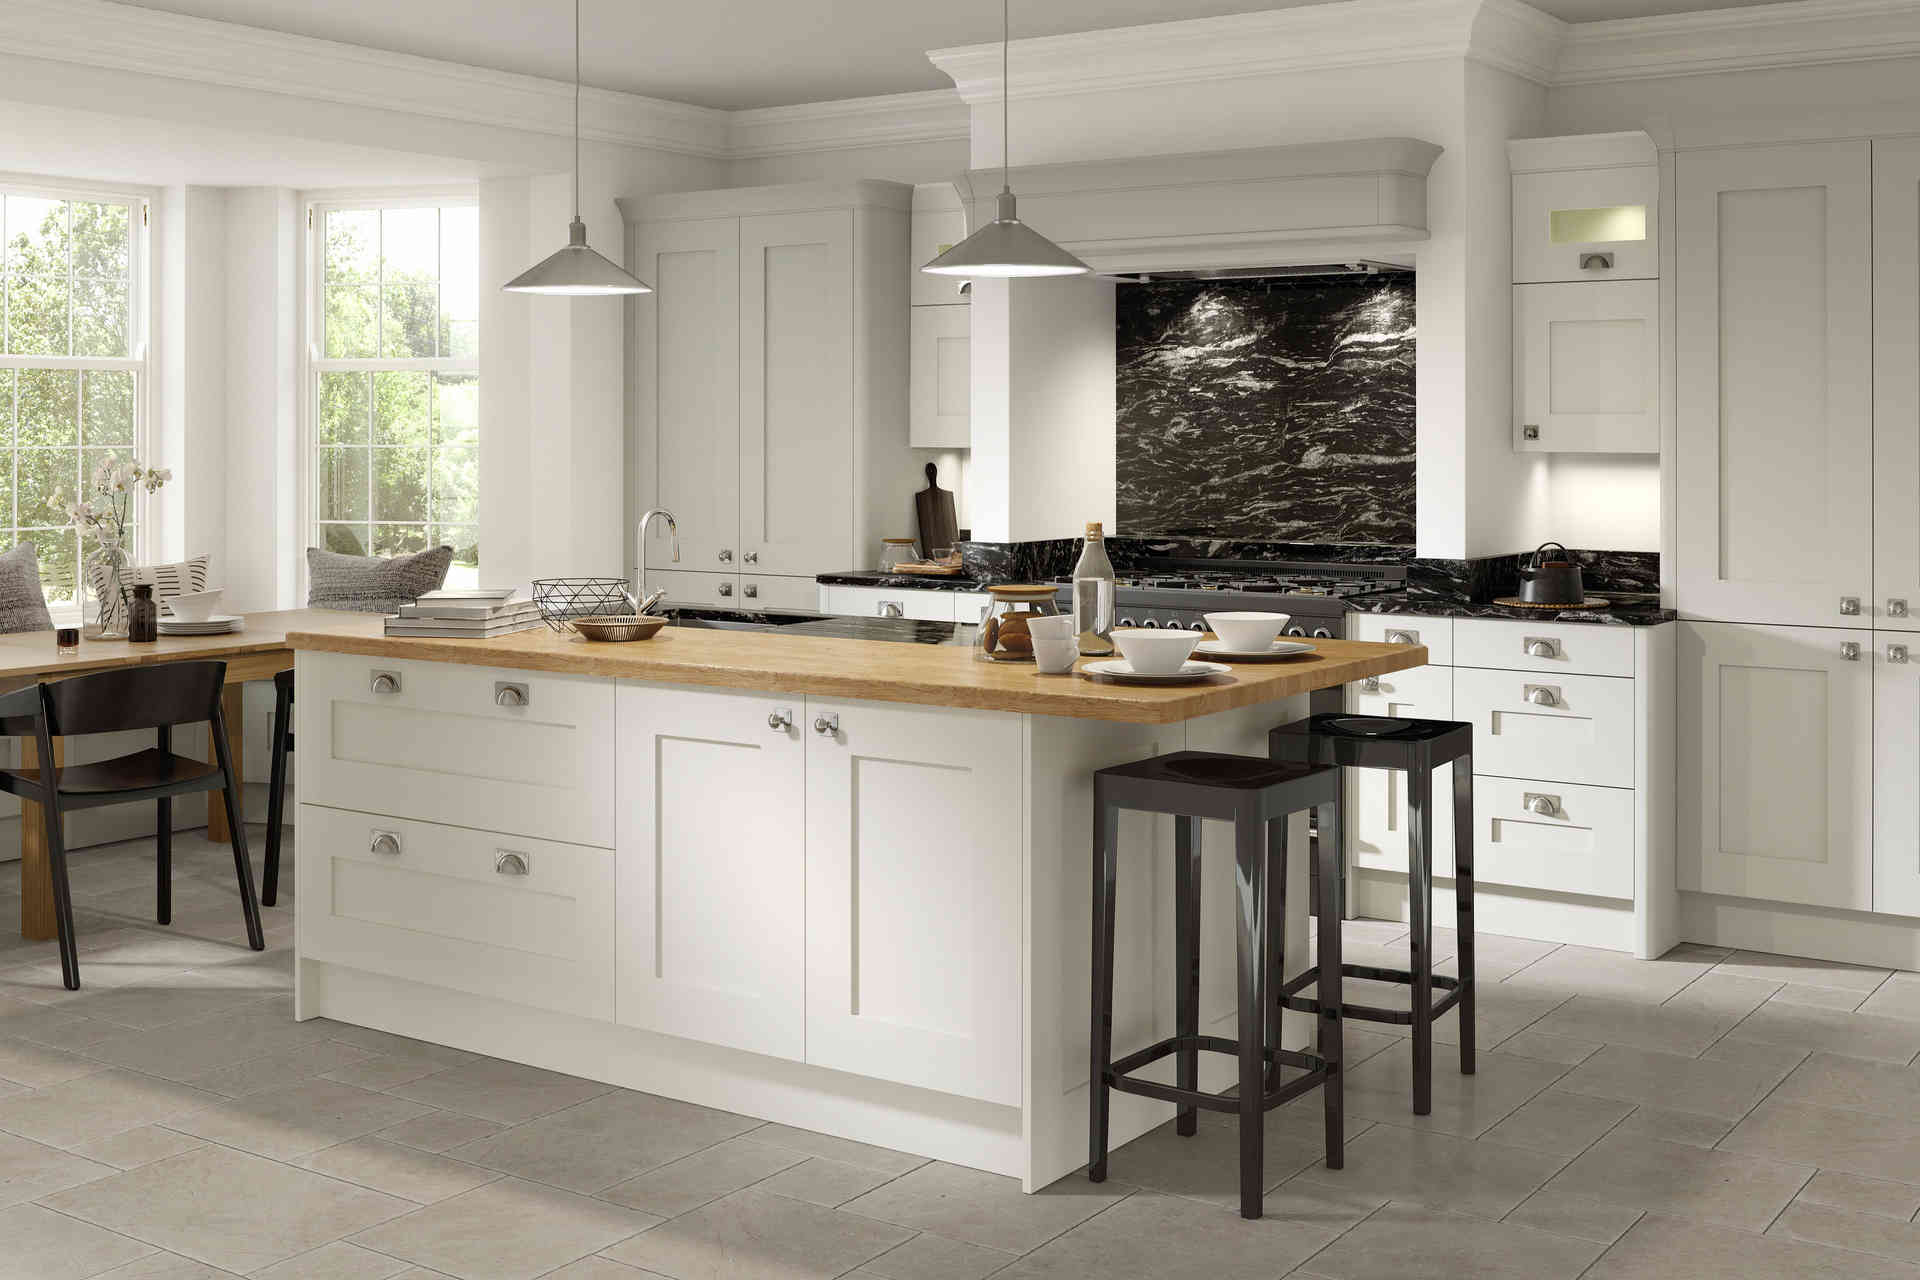 Fitzroy kitchen Porcelain & Partridge Grey